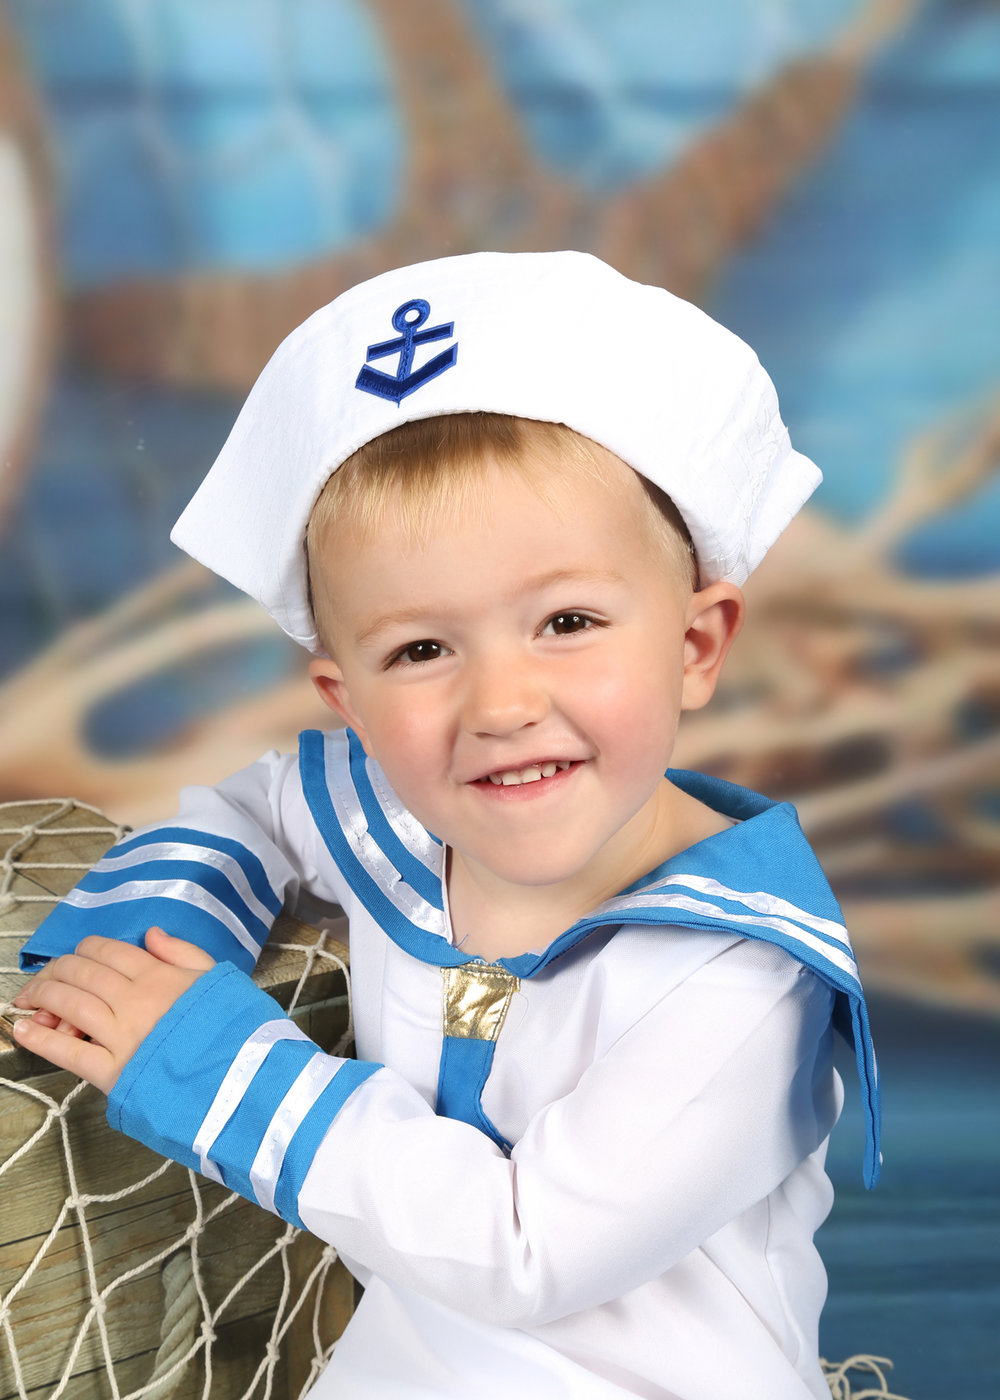 zigzag-zig-zag-photography-school-nursery-photographers-studio-photo-shoot-themed-kids-pre-school-venture-studios